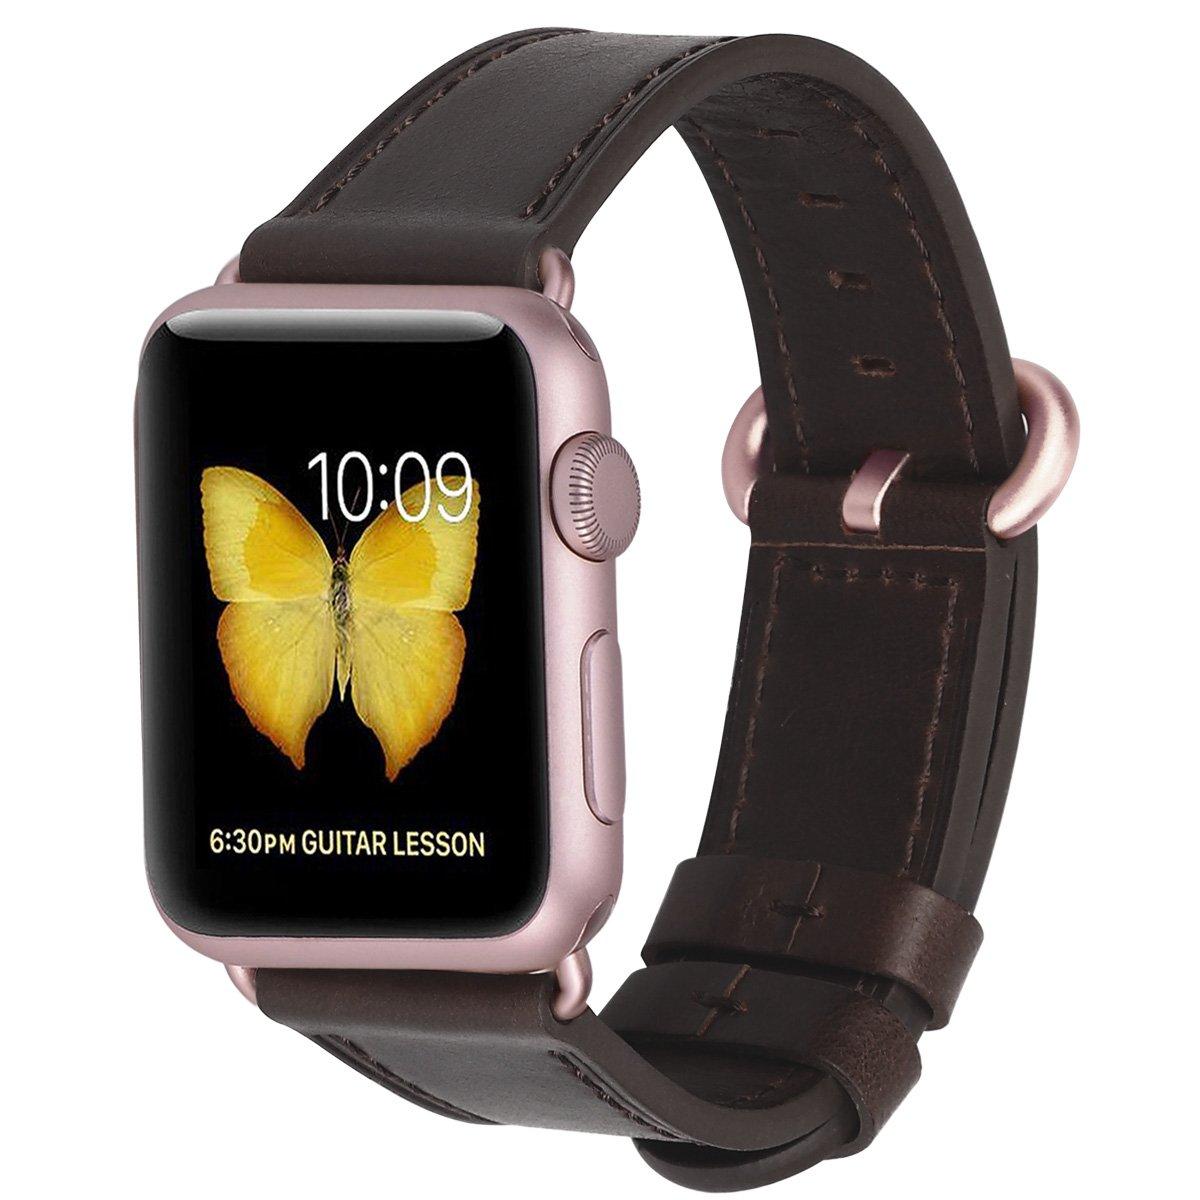 Malla Cuero para Apple Watch (38/40mm) PEAK ZHANG [7JNZKQR6]